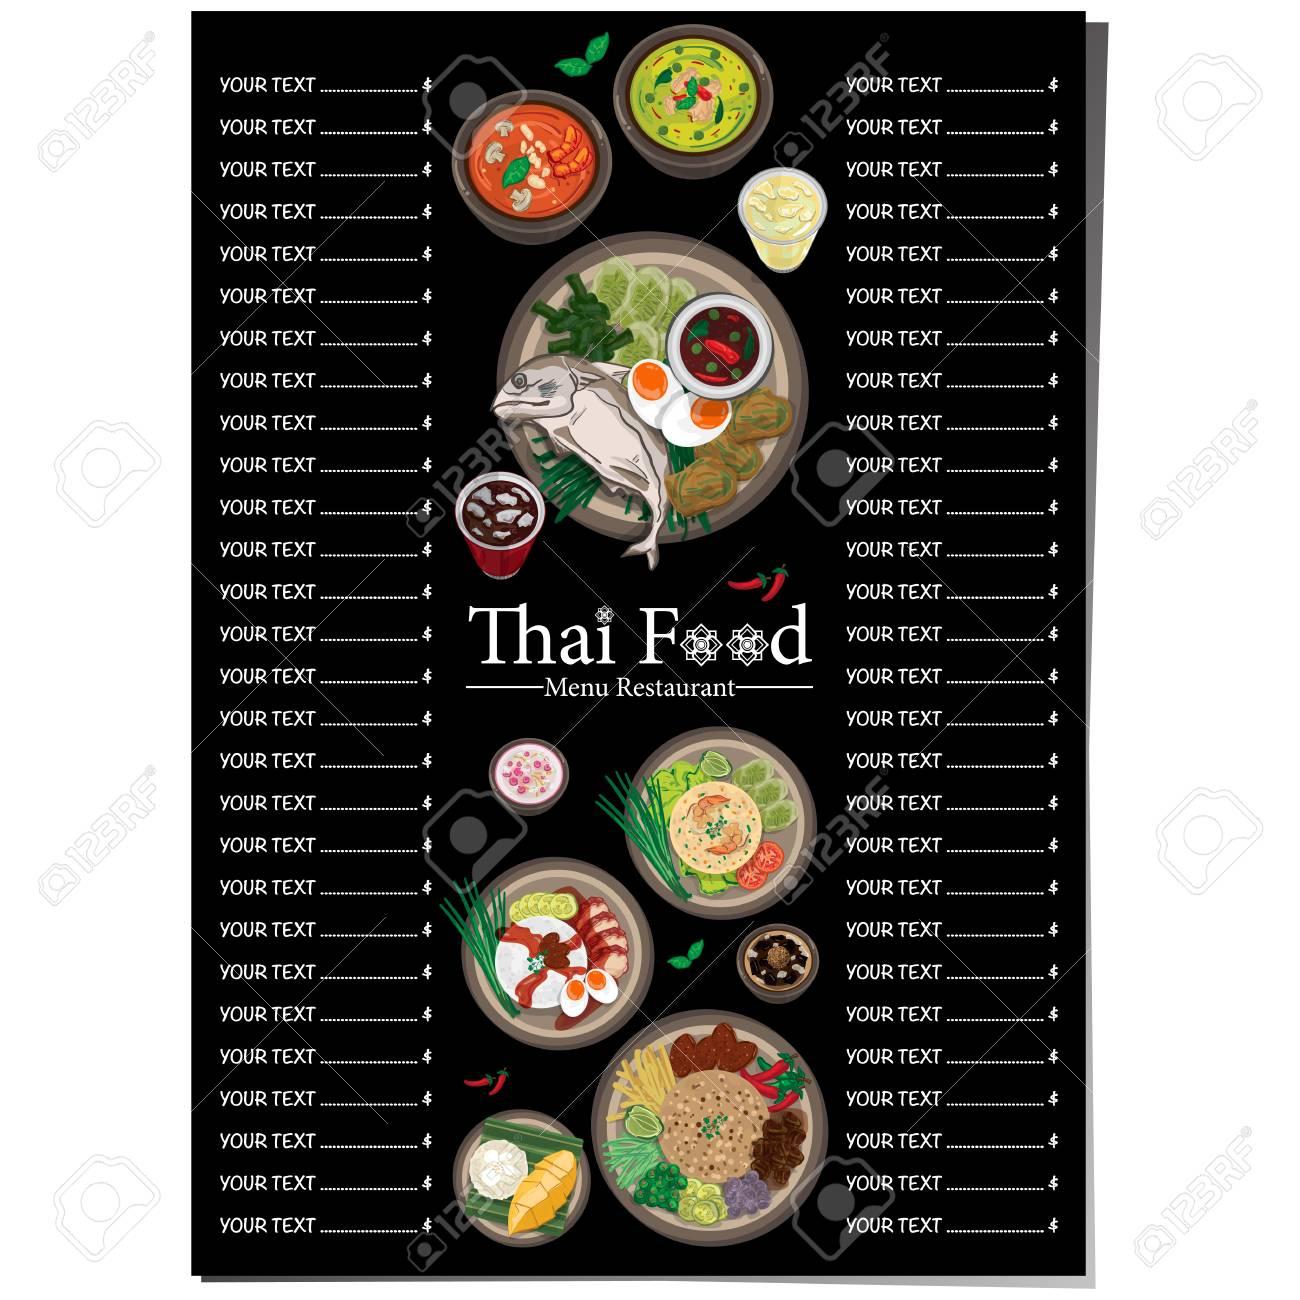 Thai Food Menu Design Template Royalty Free Cliparts Vectors And